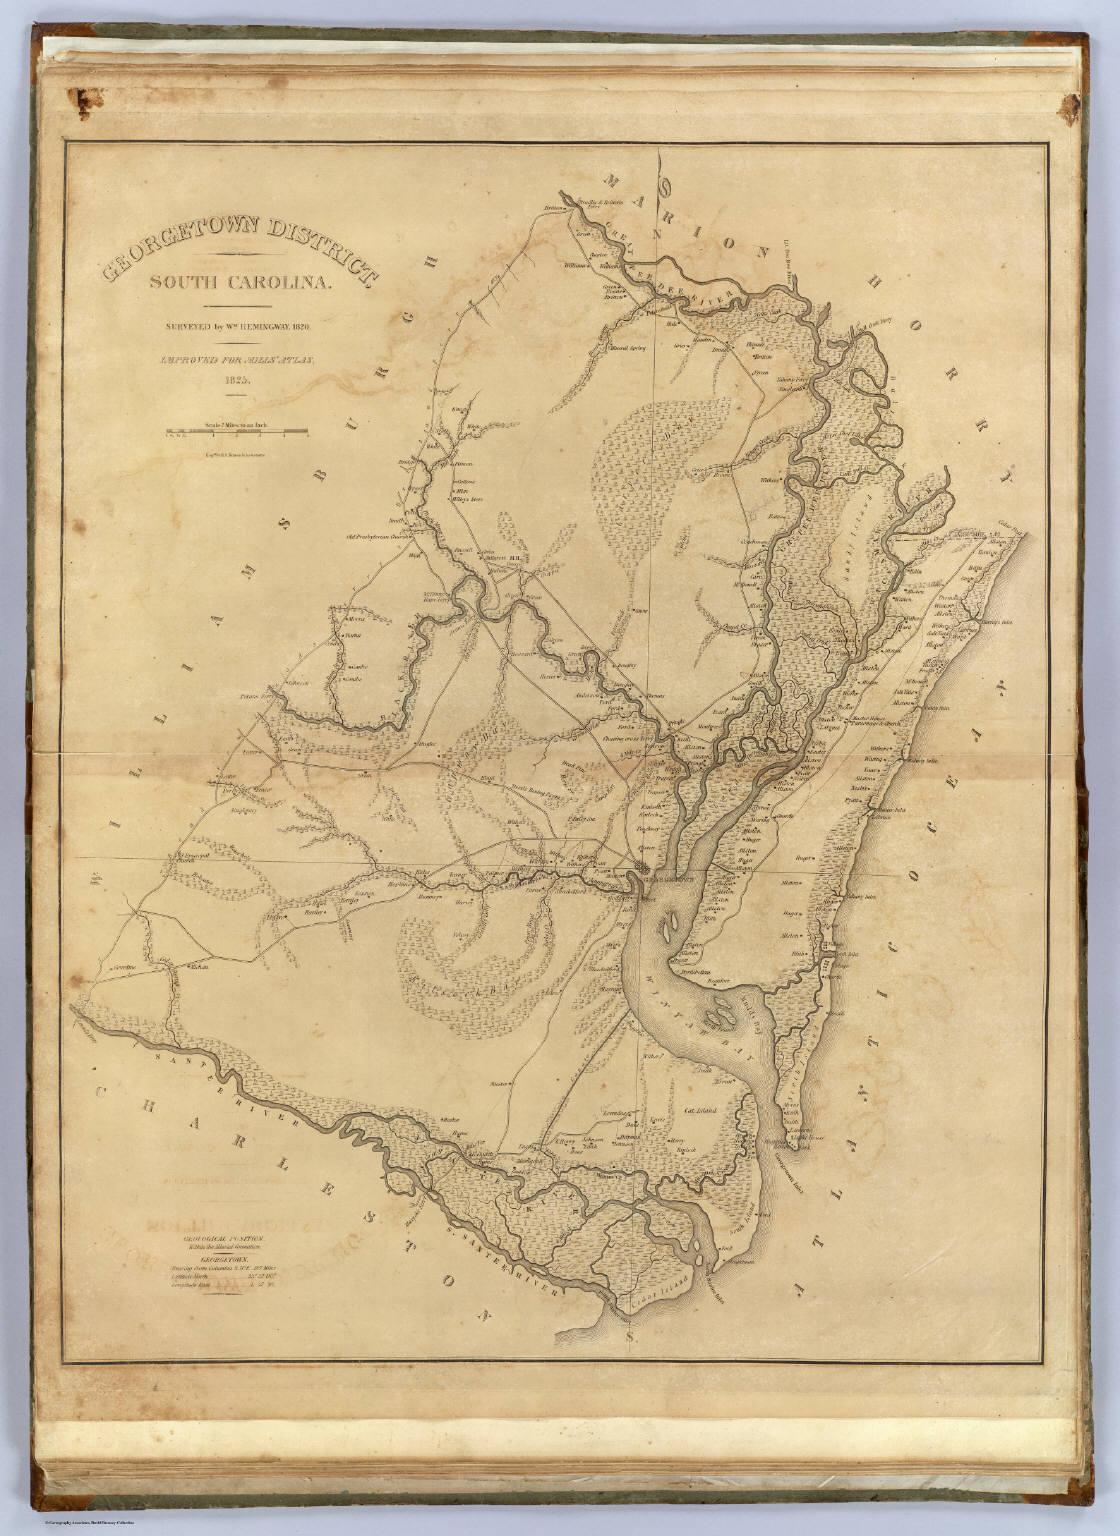 Georgetown District South Carolina David Rumsey Historical Map